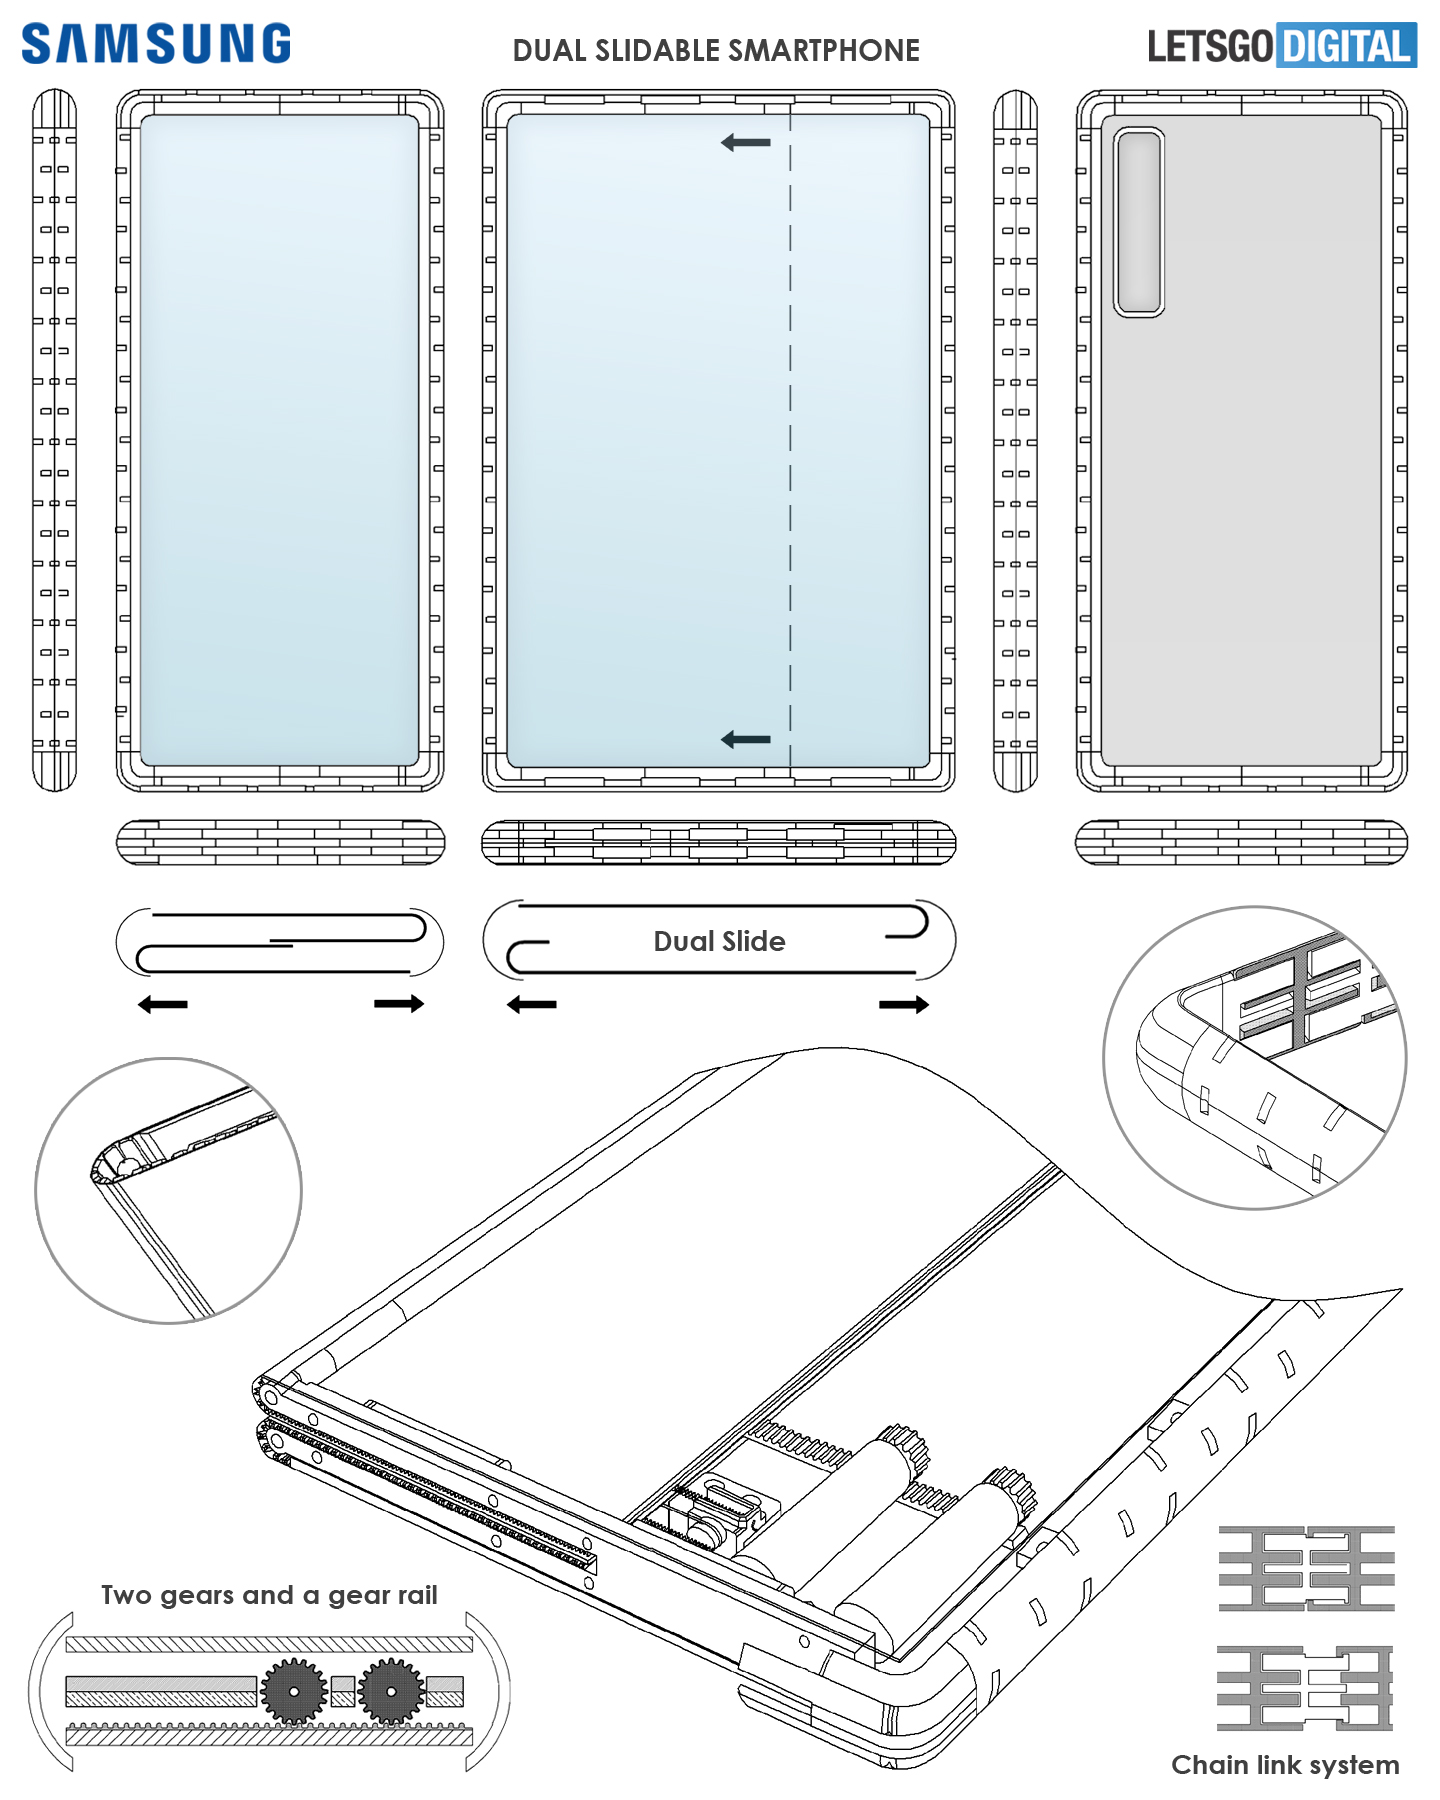 Pantalla enrollable para smartphone Samsung Slide